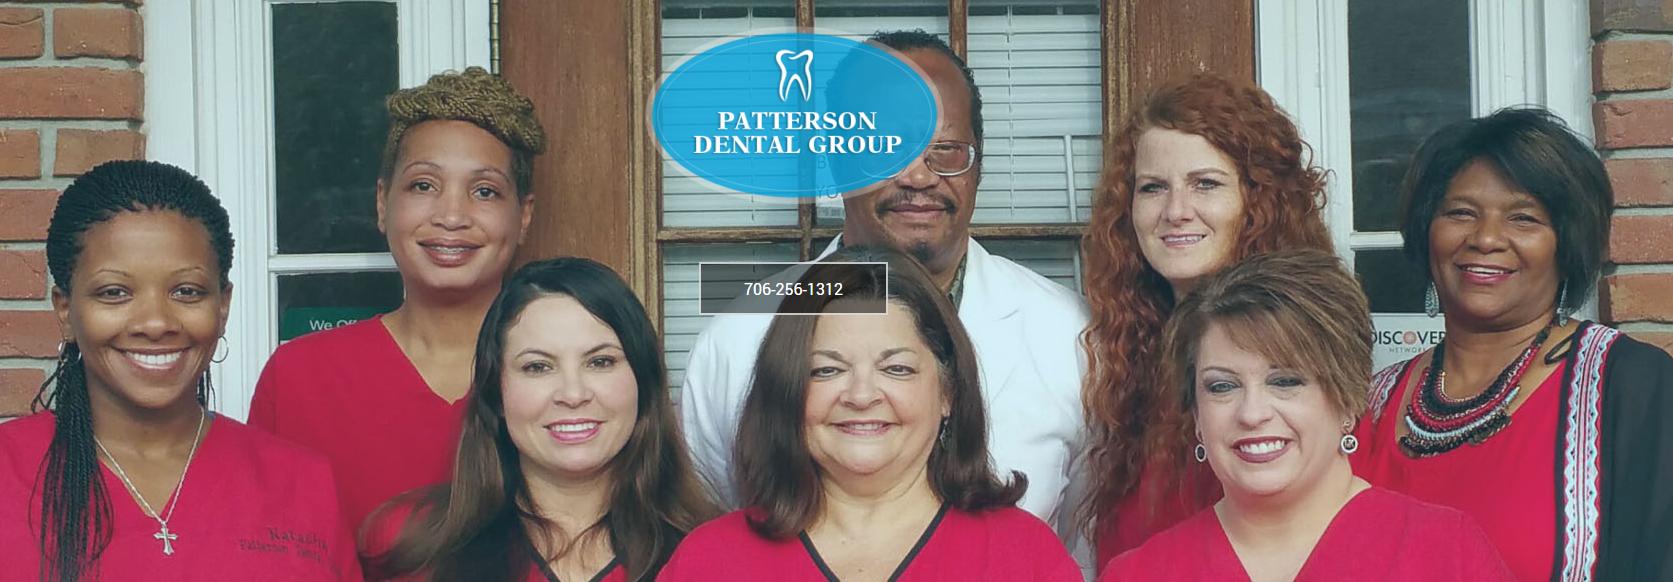 Patterson Dental Group image 4